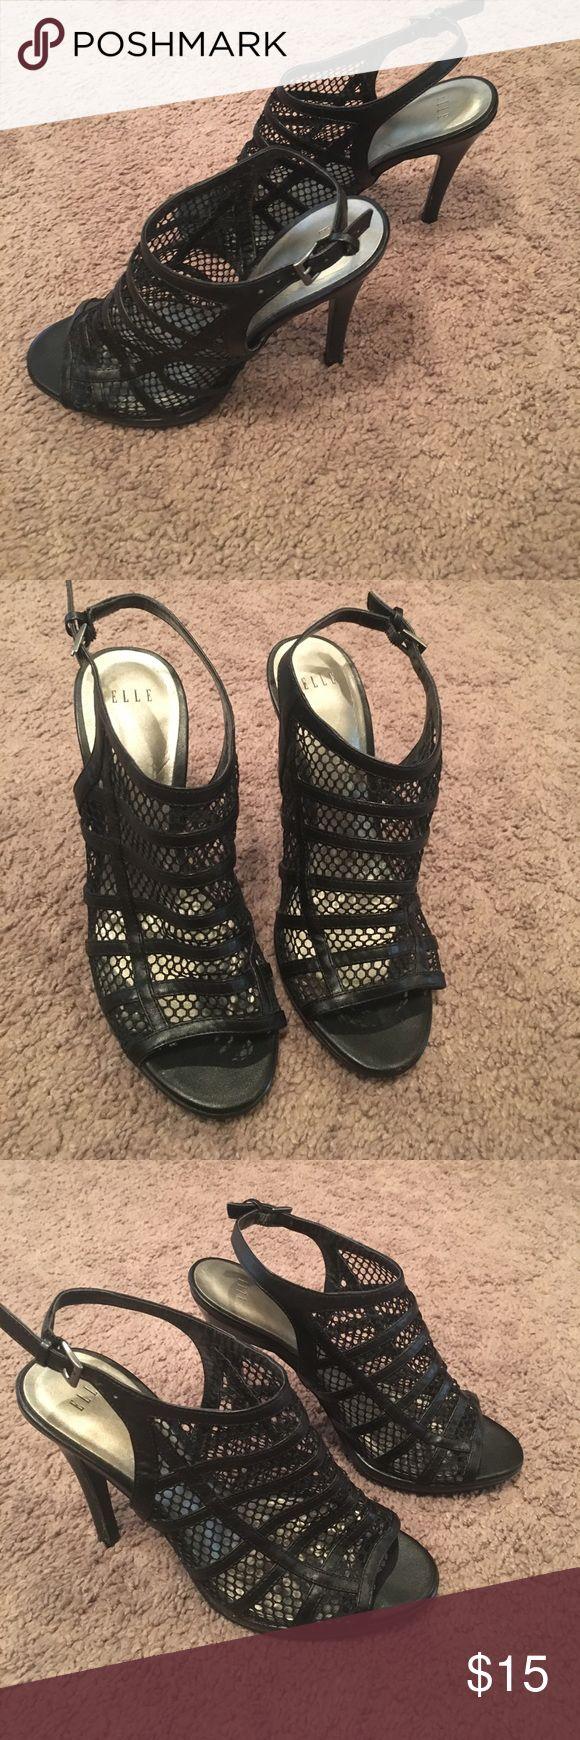 Elle Black shoes Super comfy Elle Black heels. Good condition with adjustable strap around heel fishnet front with open toe Elle Shoes Heels